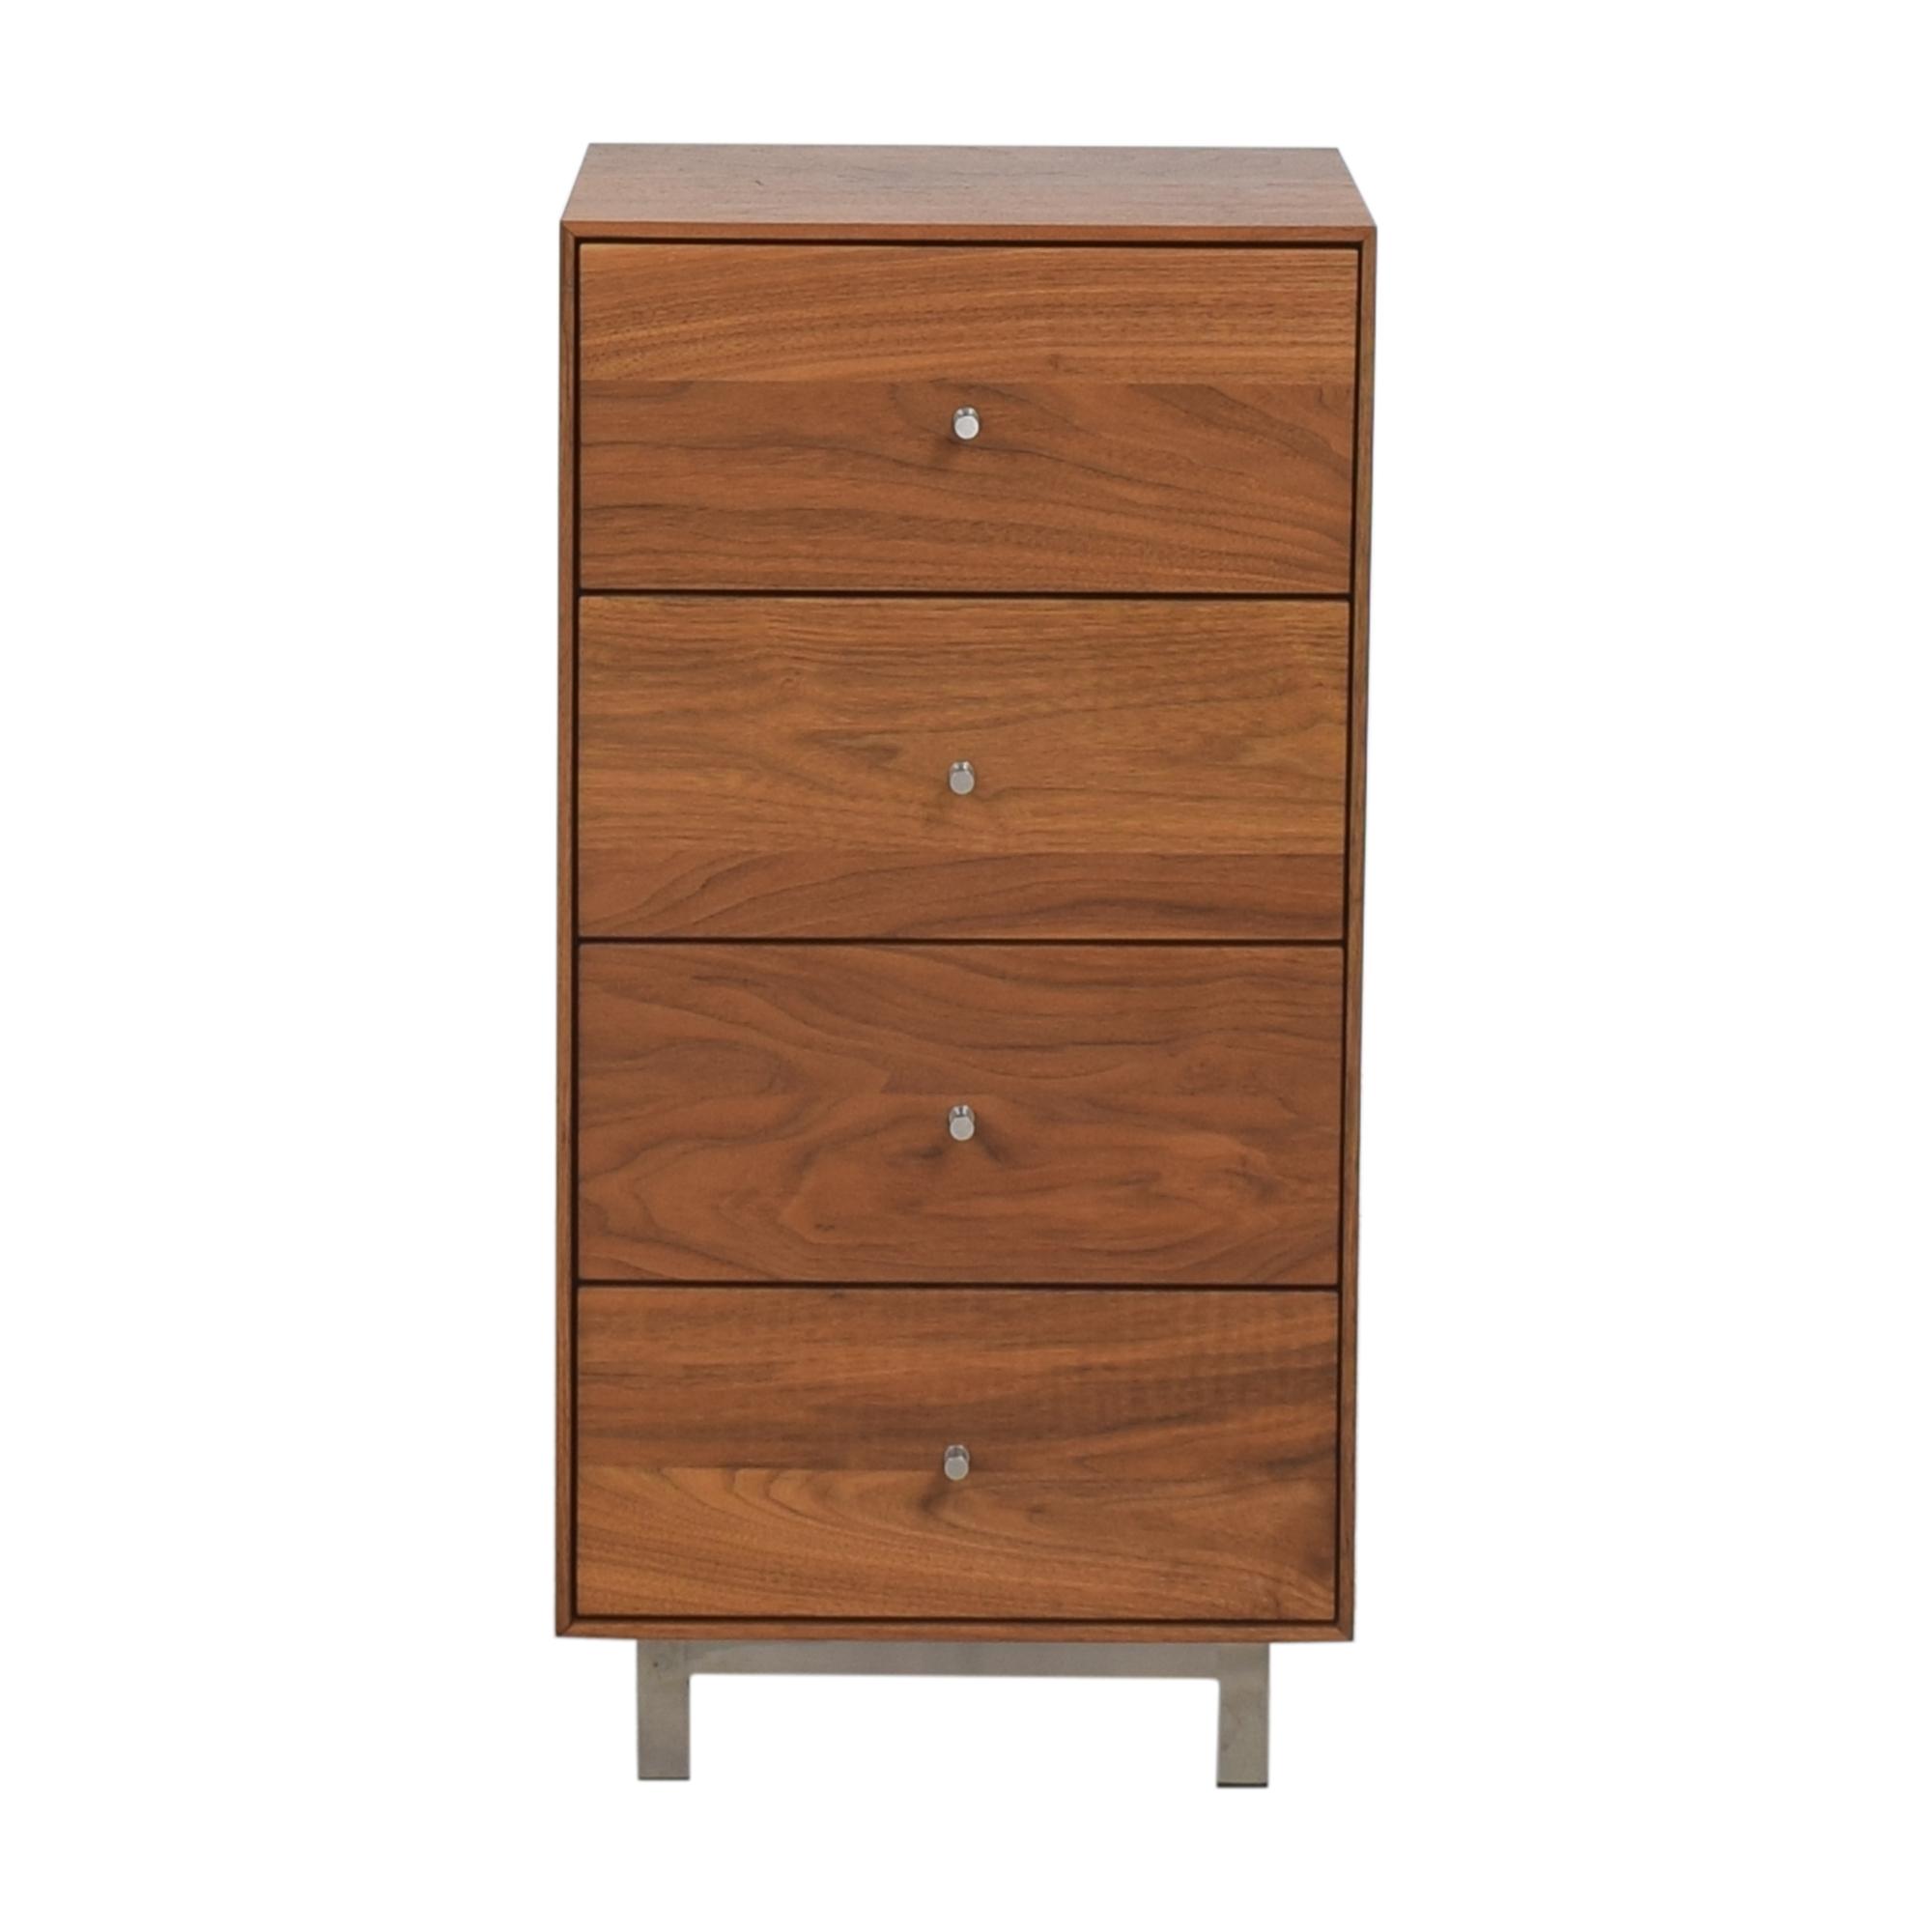 Room & Board Room & Board Hudson Storage Cabinet second hand